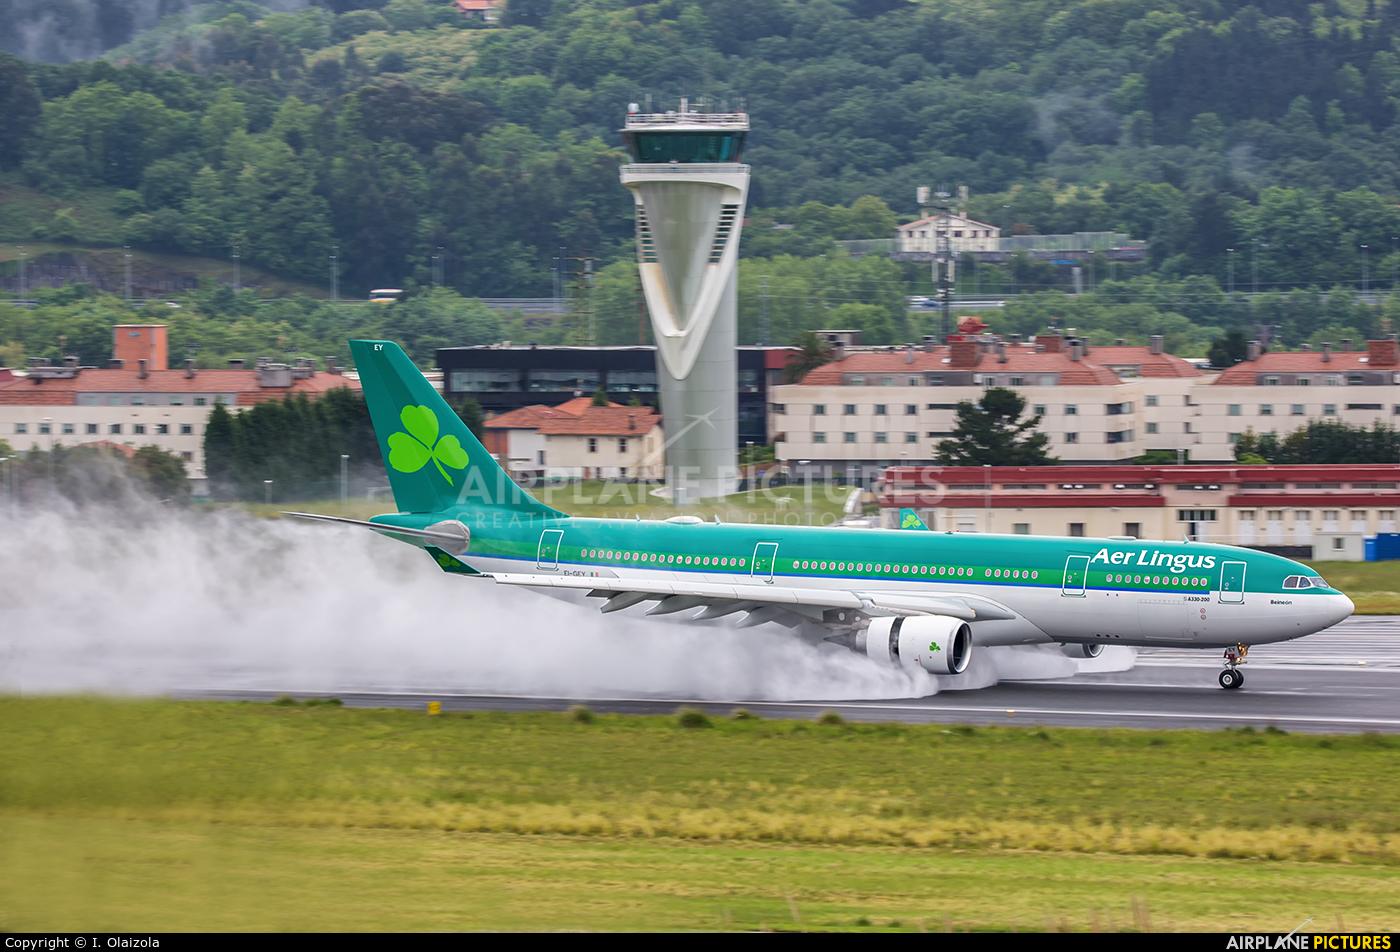 Aer Lingus EI-GEY aircraft at Bilbao